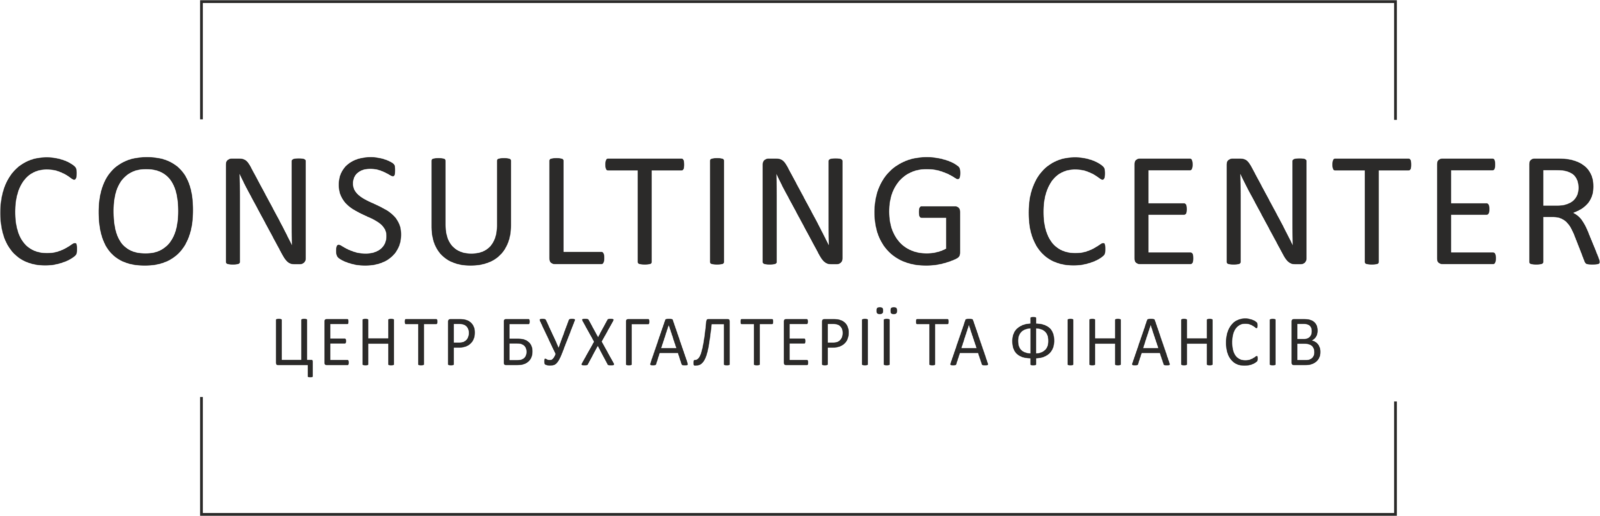 Consulting Center — центр бухгалтерії та фінансів